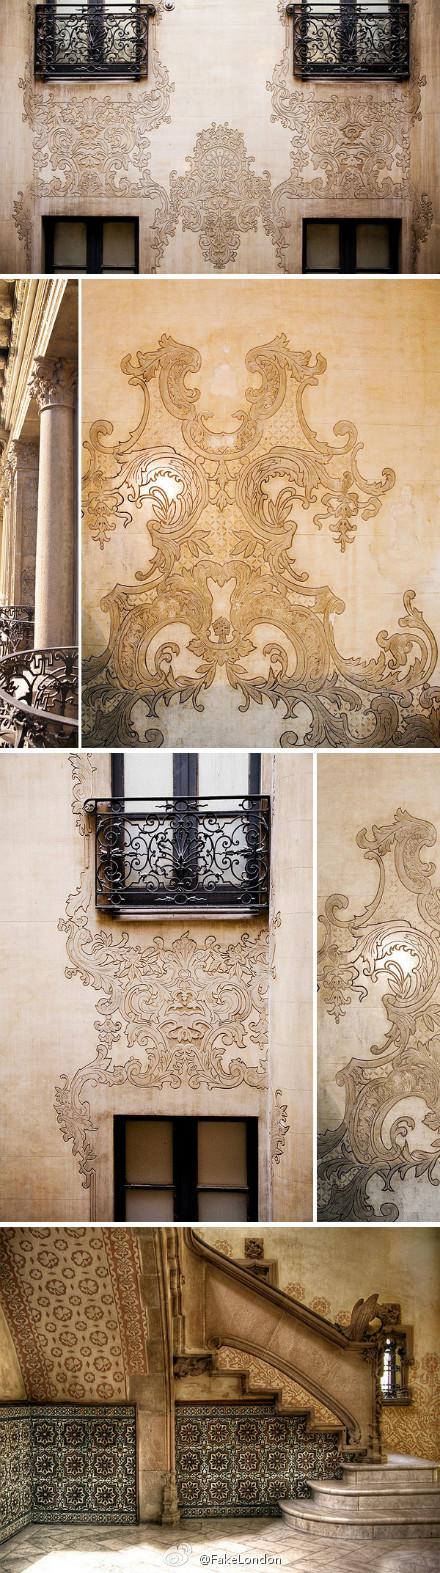 House lace, Barcelona, Spain